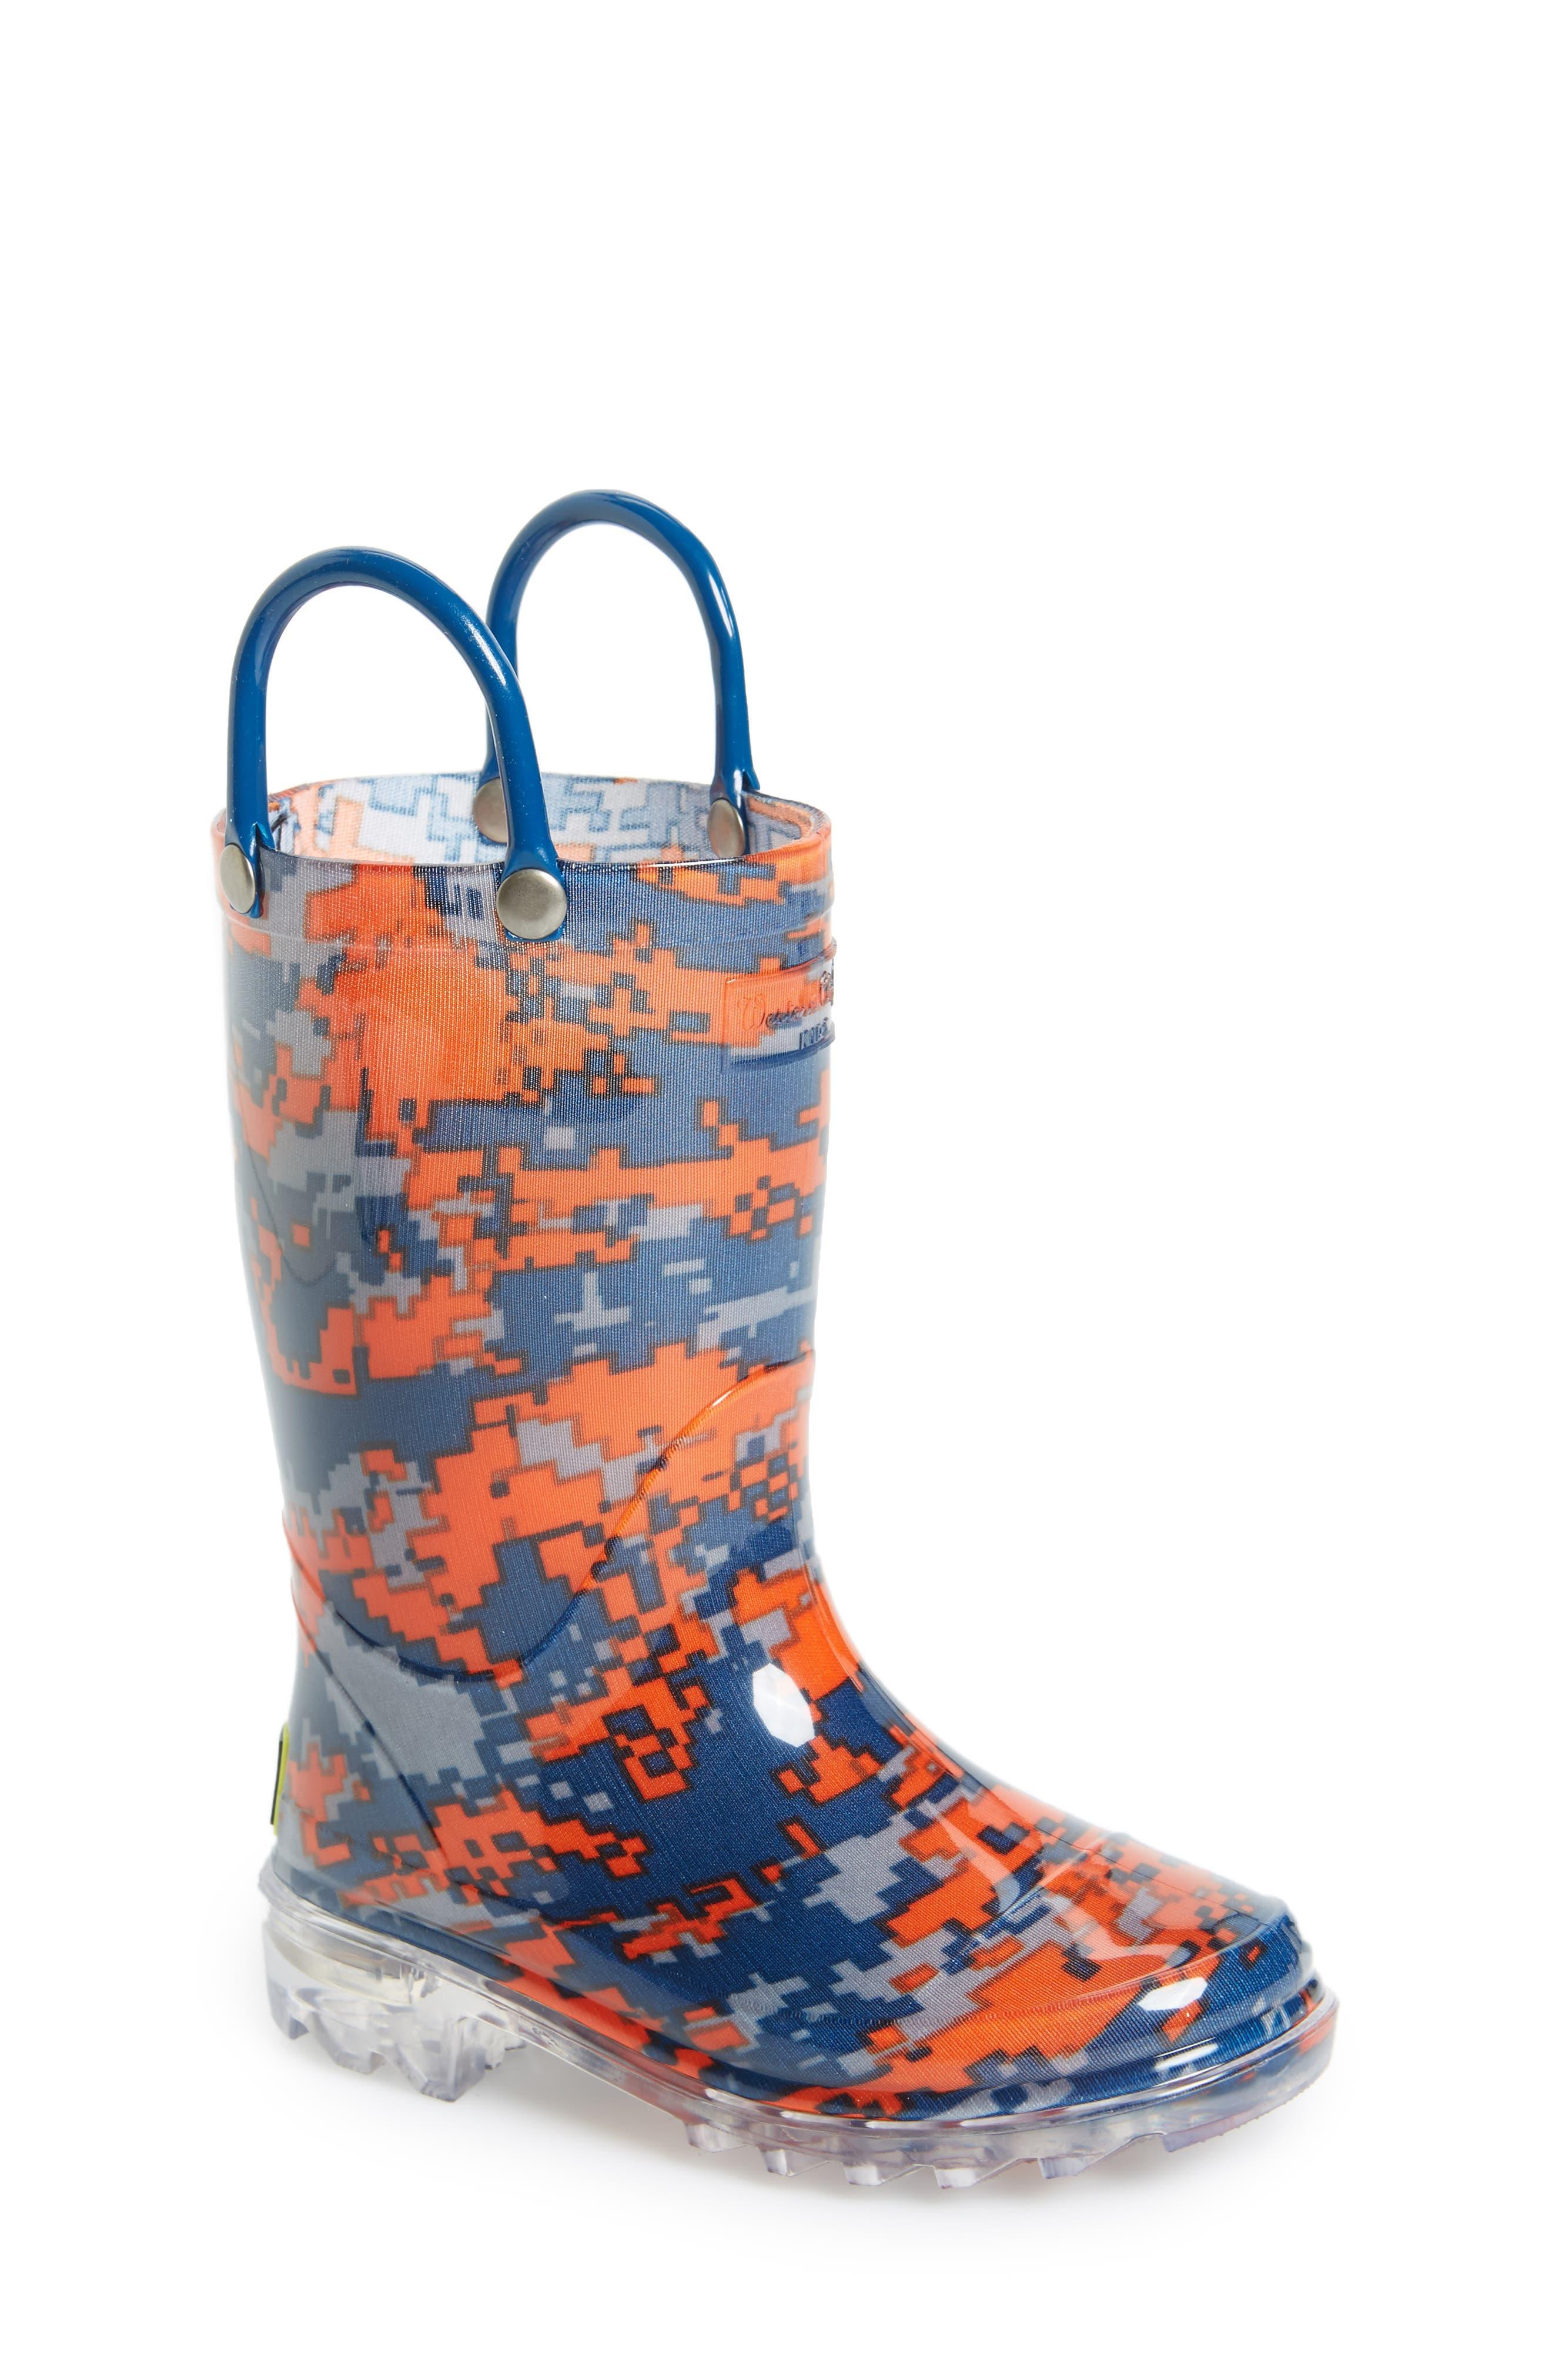 Western Chief Digital Camo Light-Up Rain Boot (Toddler & Little Kid)